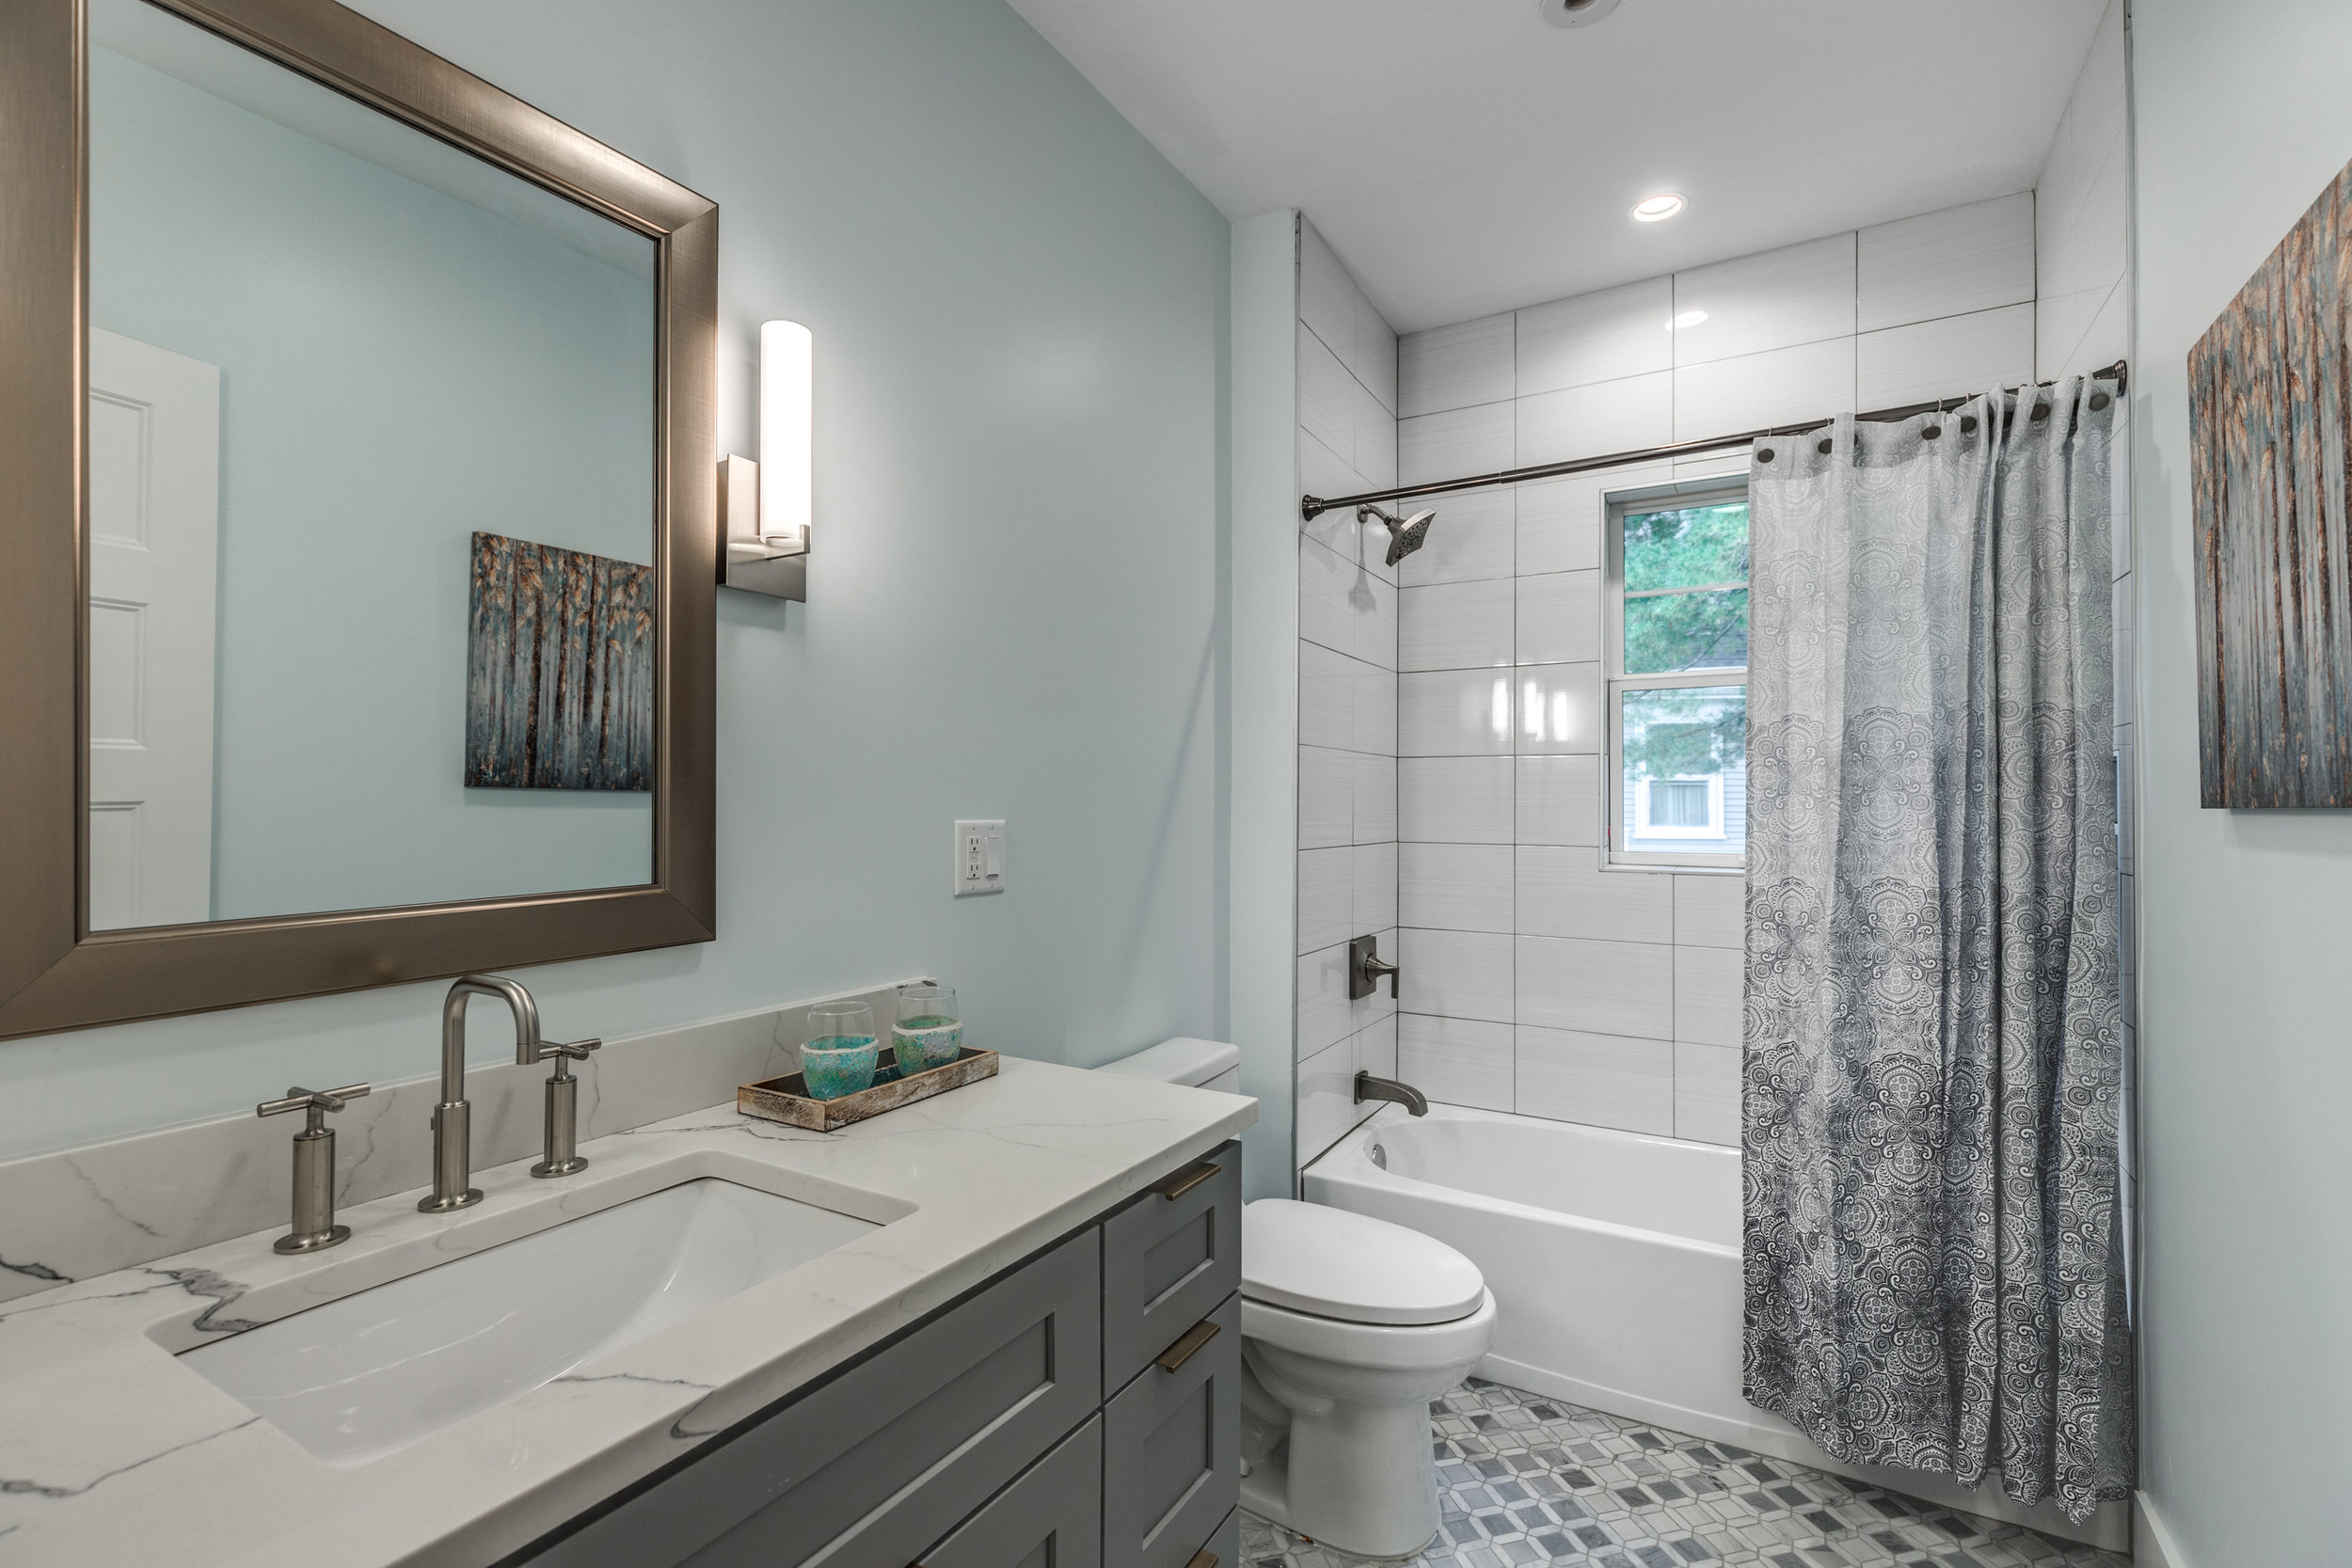 23_Bathroom-4.jpg